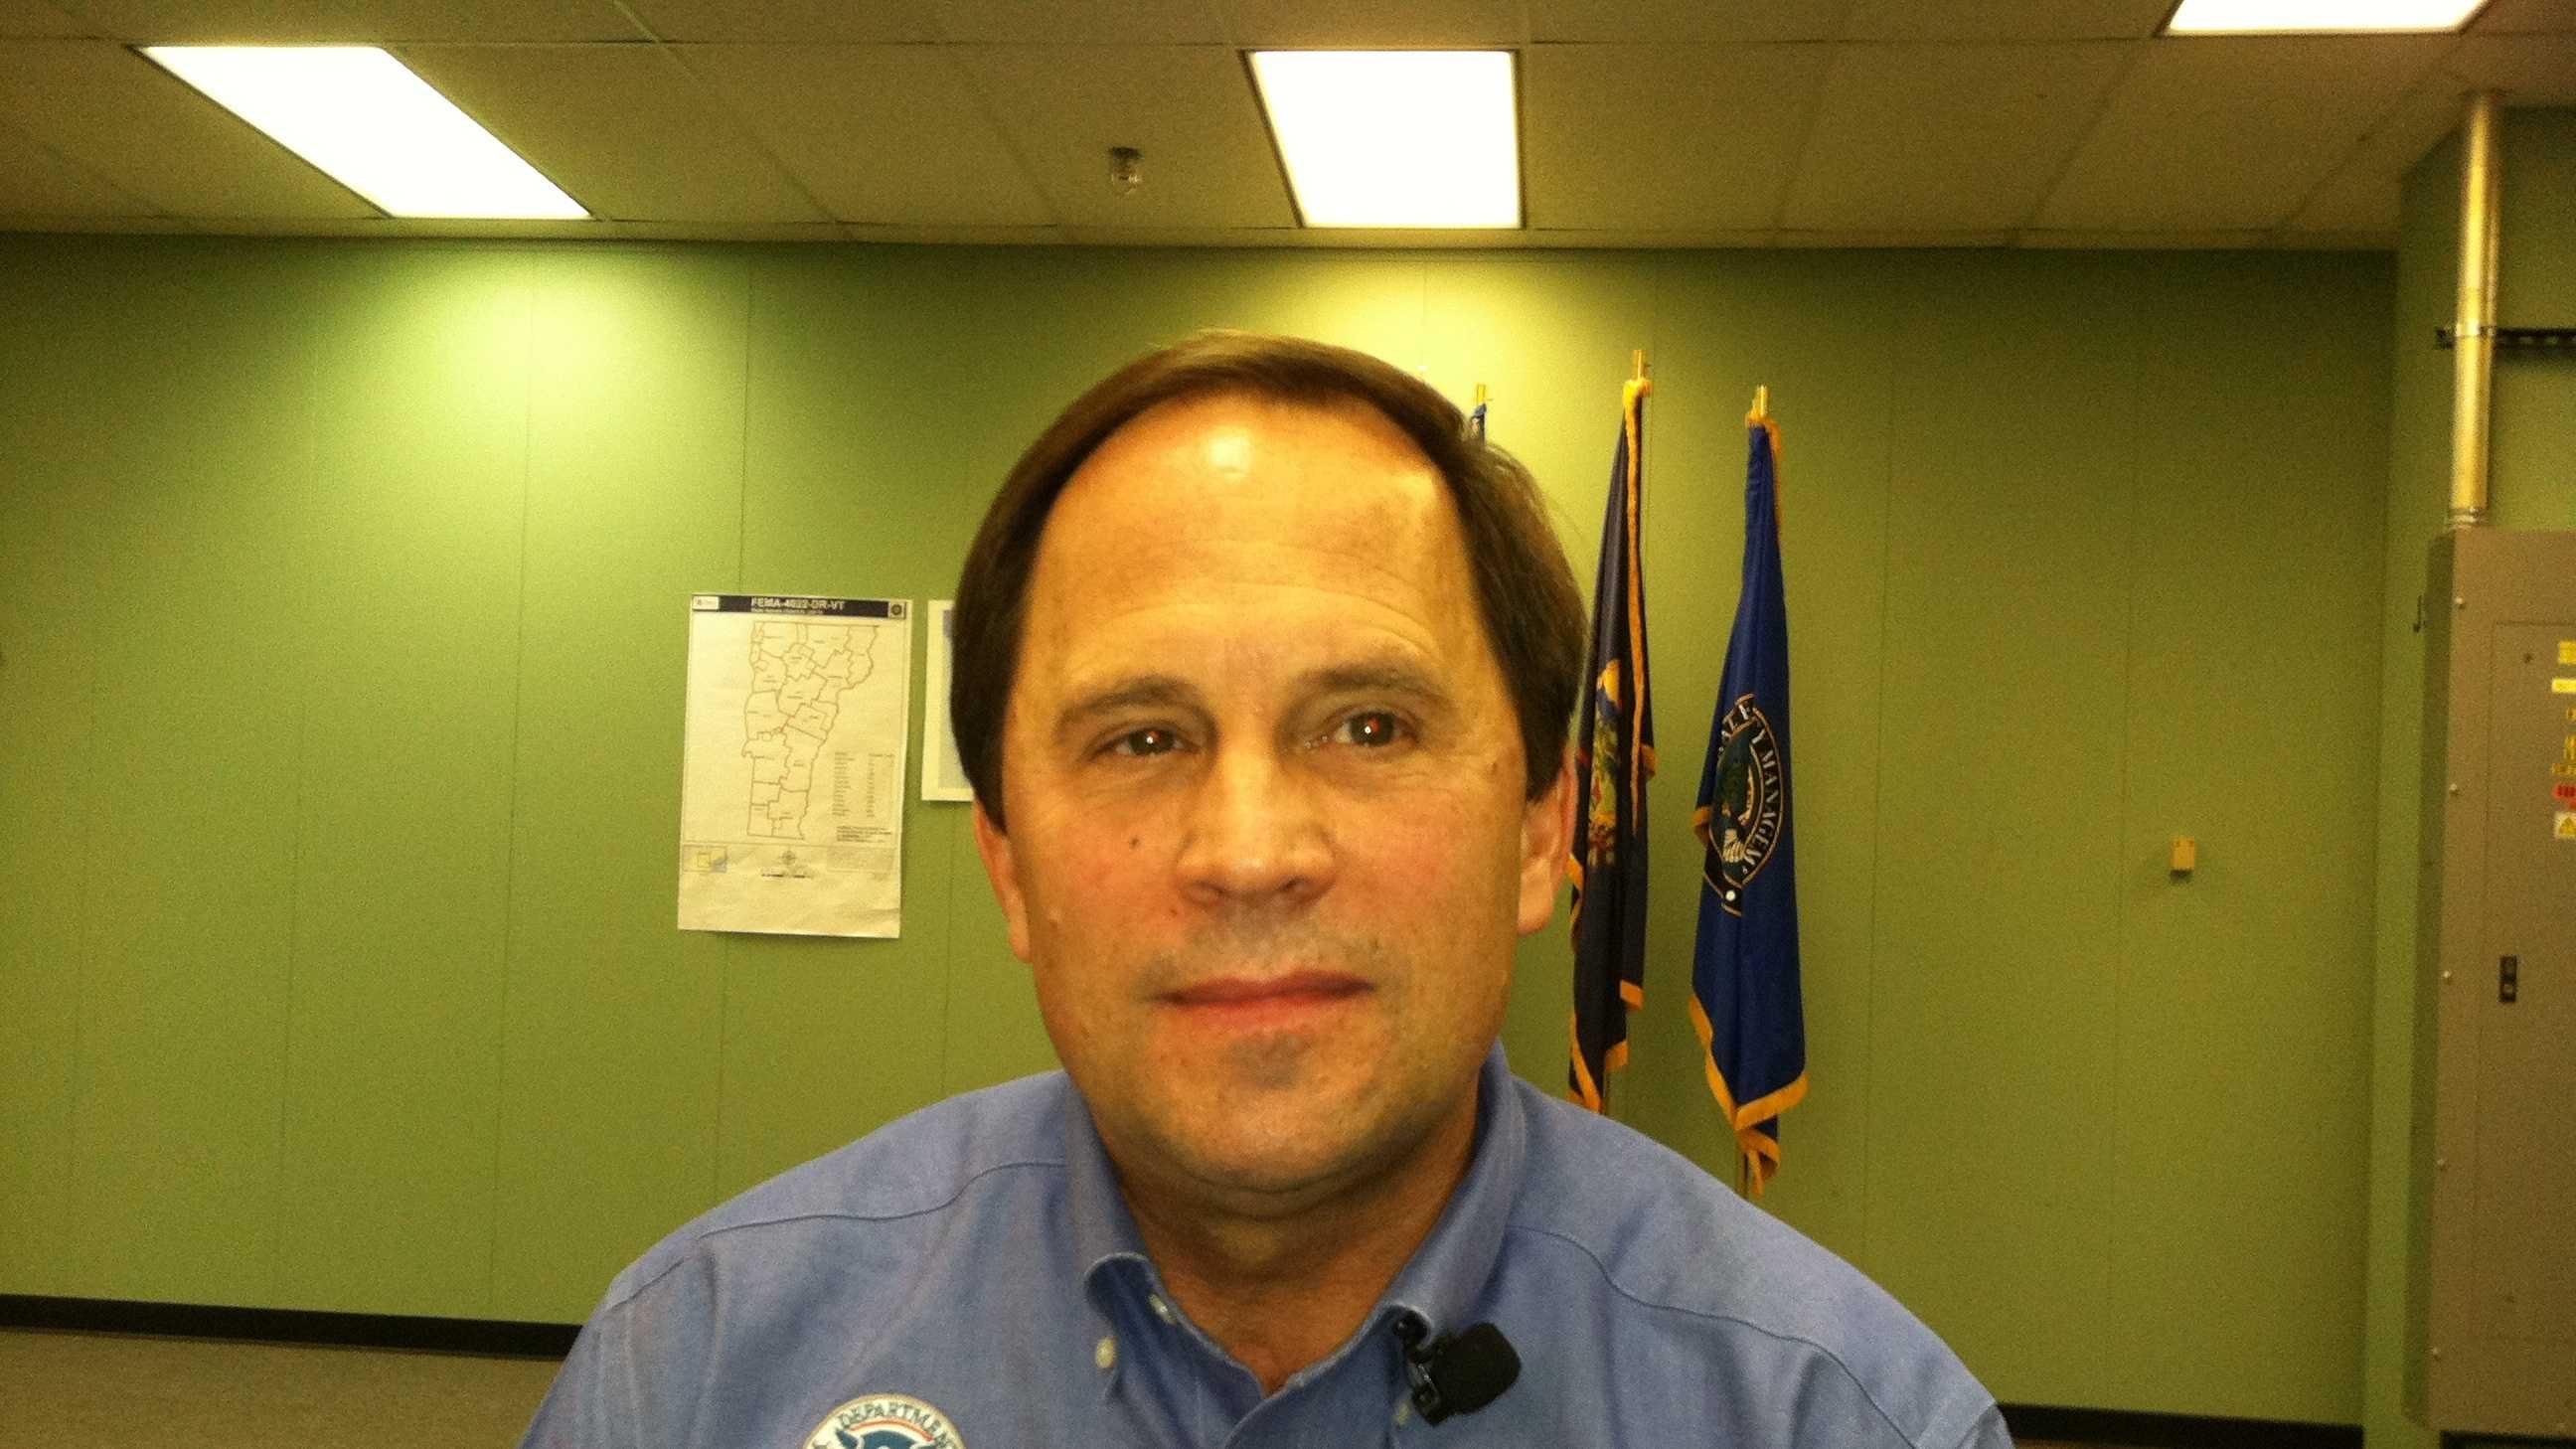 Mark Landry, FEMA's coordinating officer in Vermont